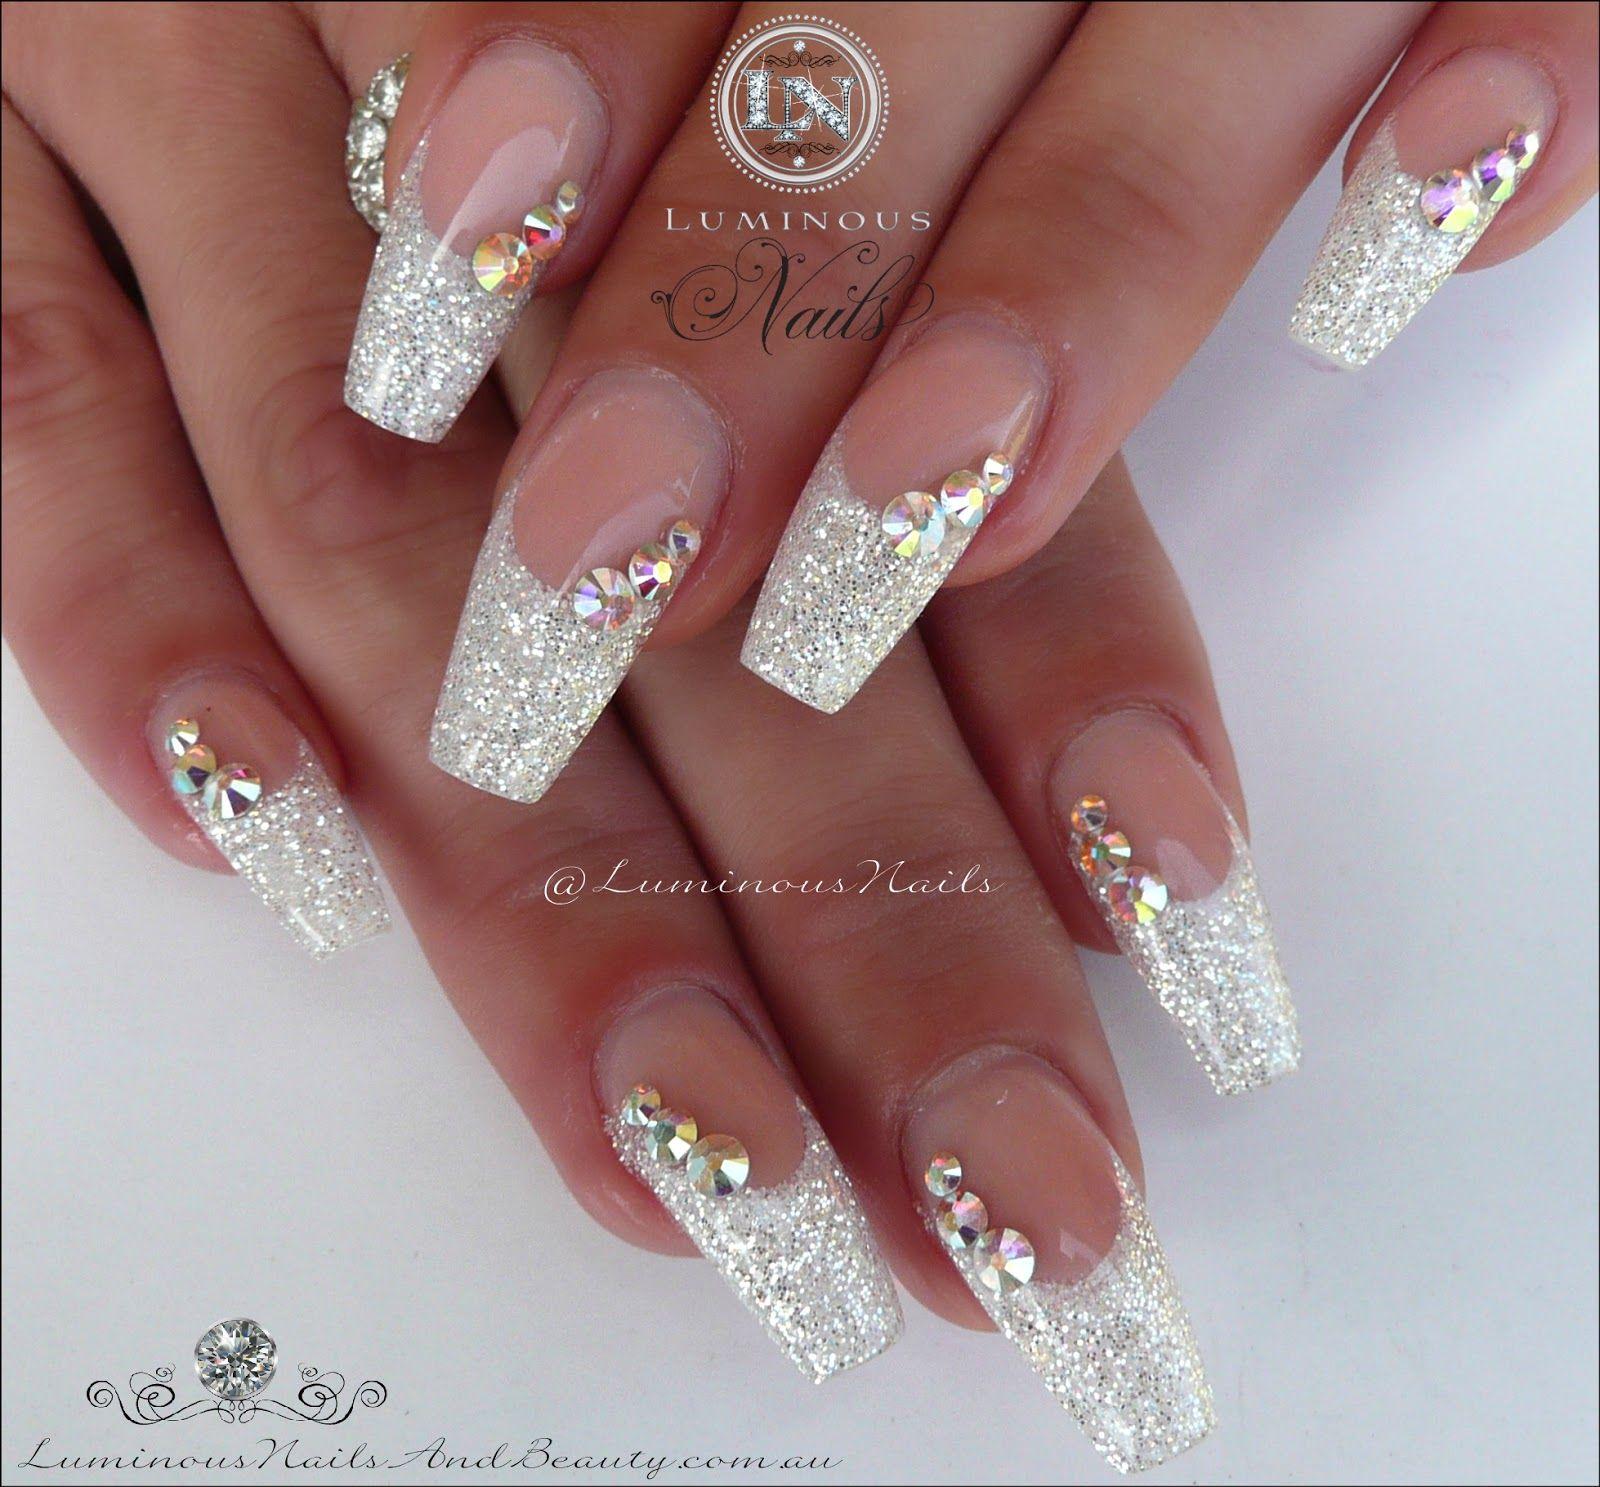 Luminous+Nails+%26+Beauty%2C+Gold+Coast+QLD.+White